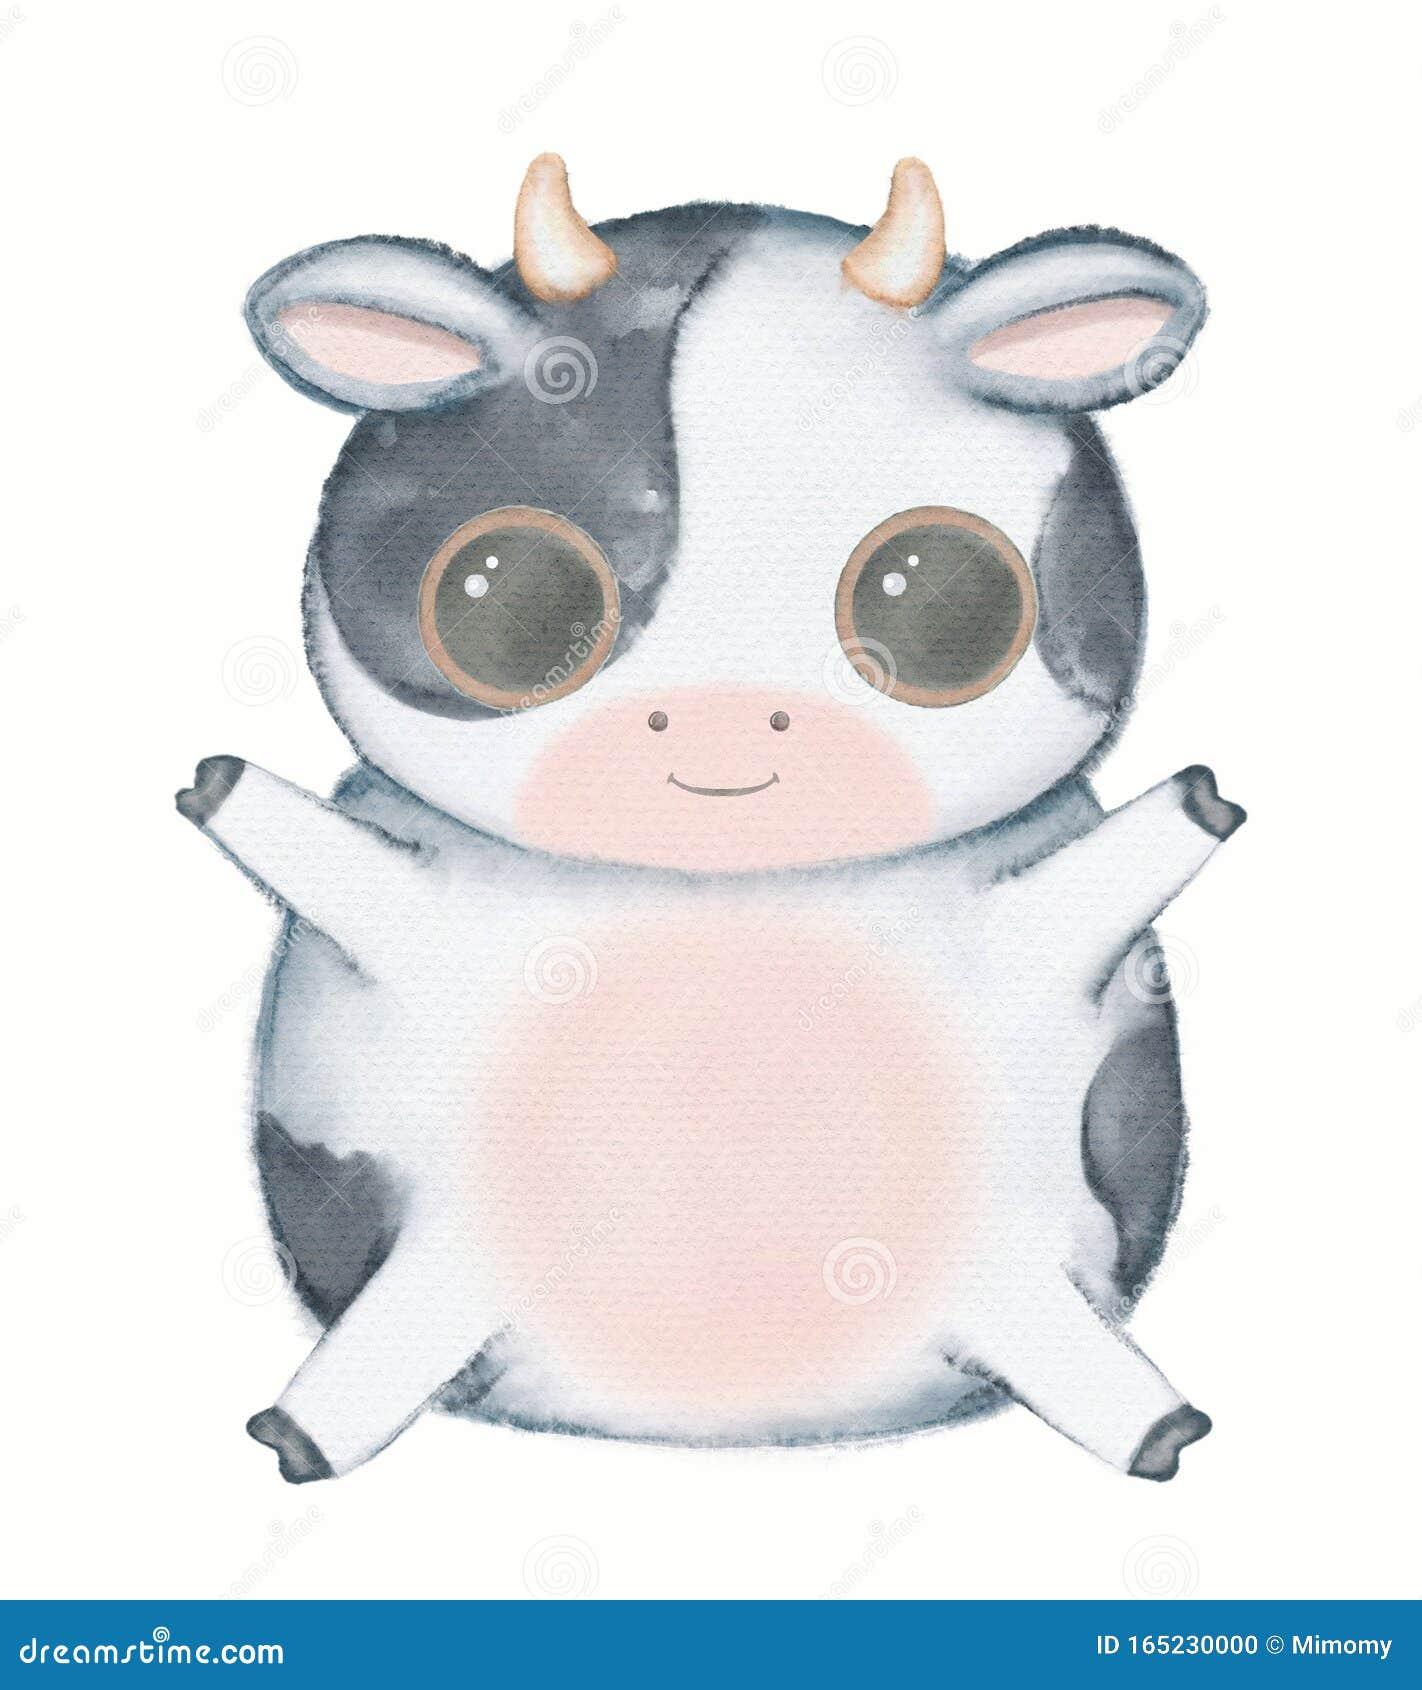 Watercolor Cartoon Kawaii Funny Cow Stock Photo Image Of Cartoon